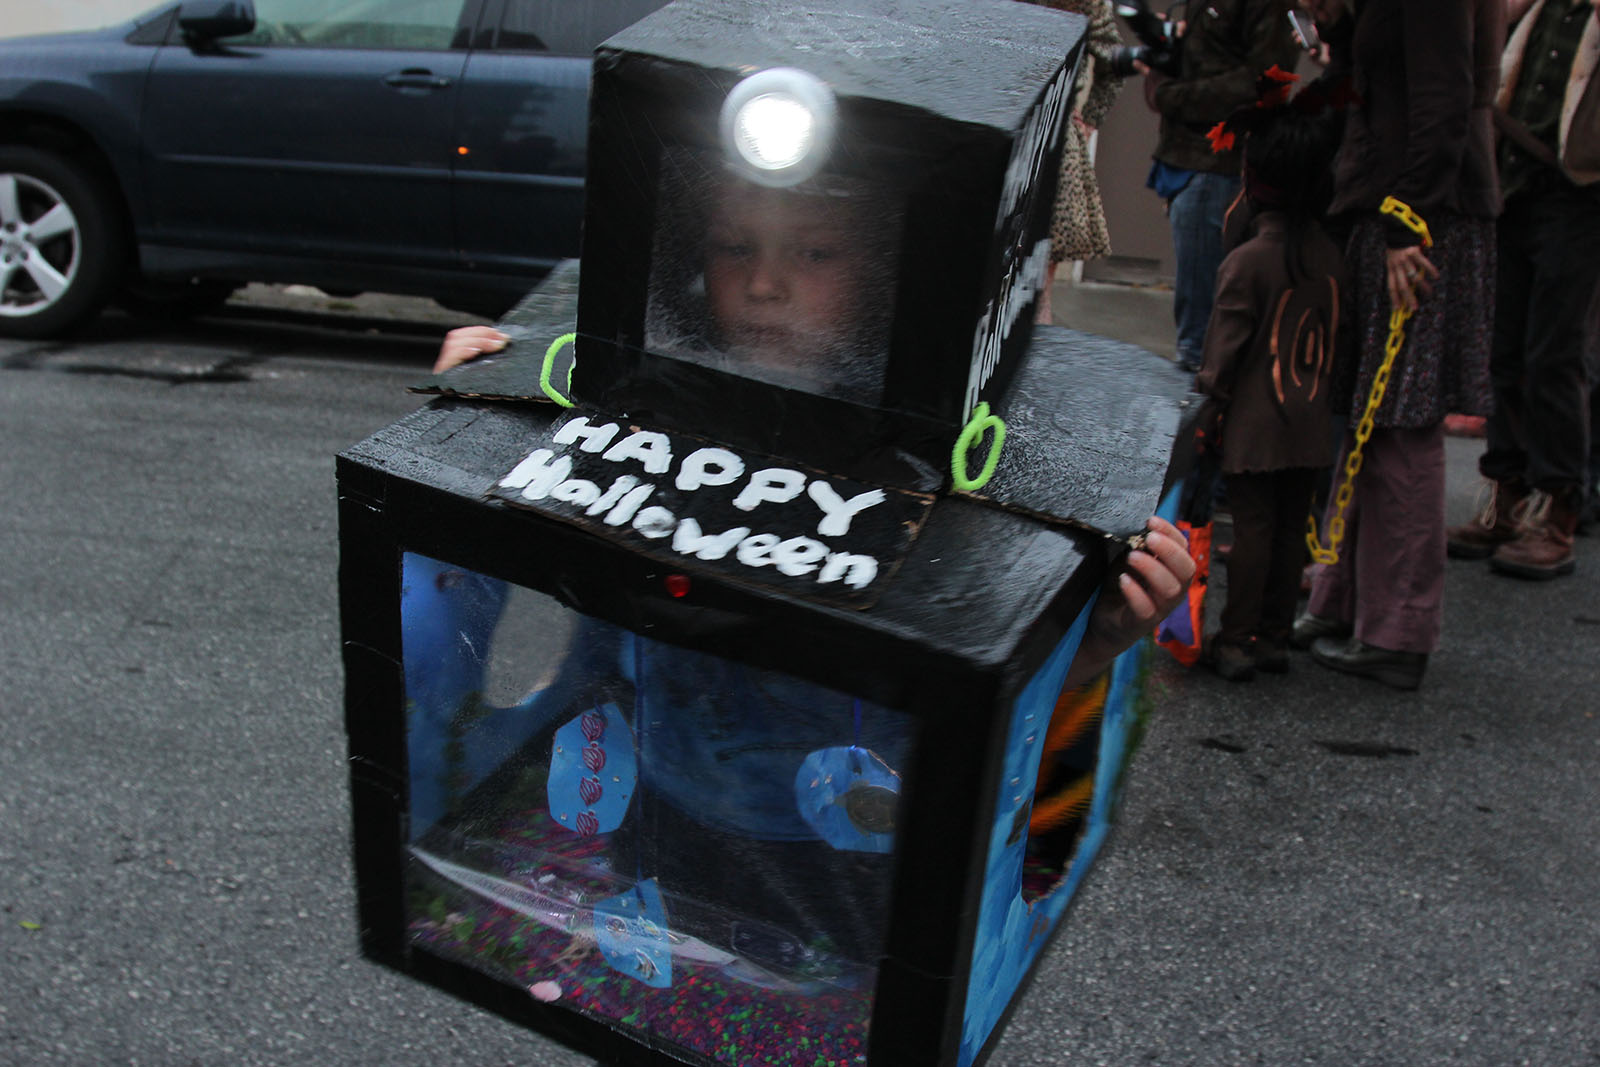 Calder, dressed as a fish tank shows his Halloween spirit. Photo by Alejandro B. Rosas